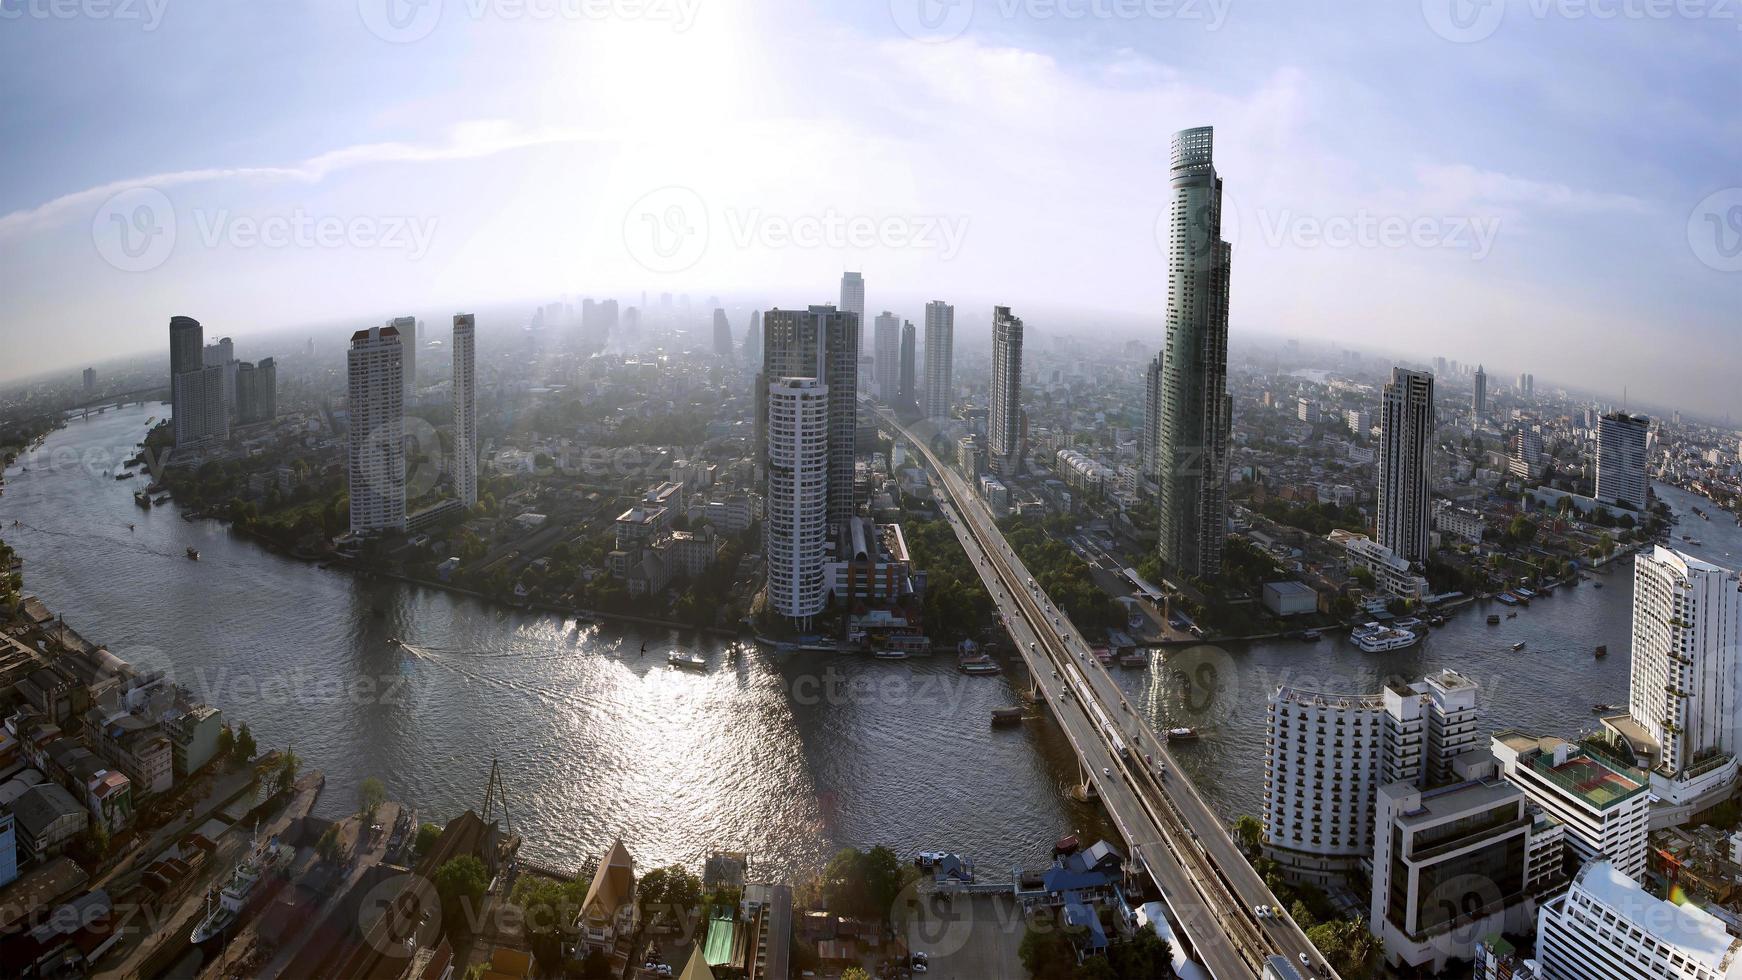 skyline van bangkok met stad voor zonsondergang foto